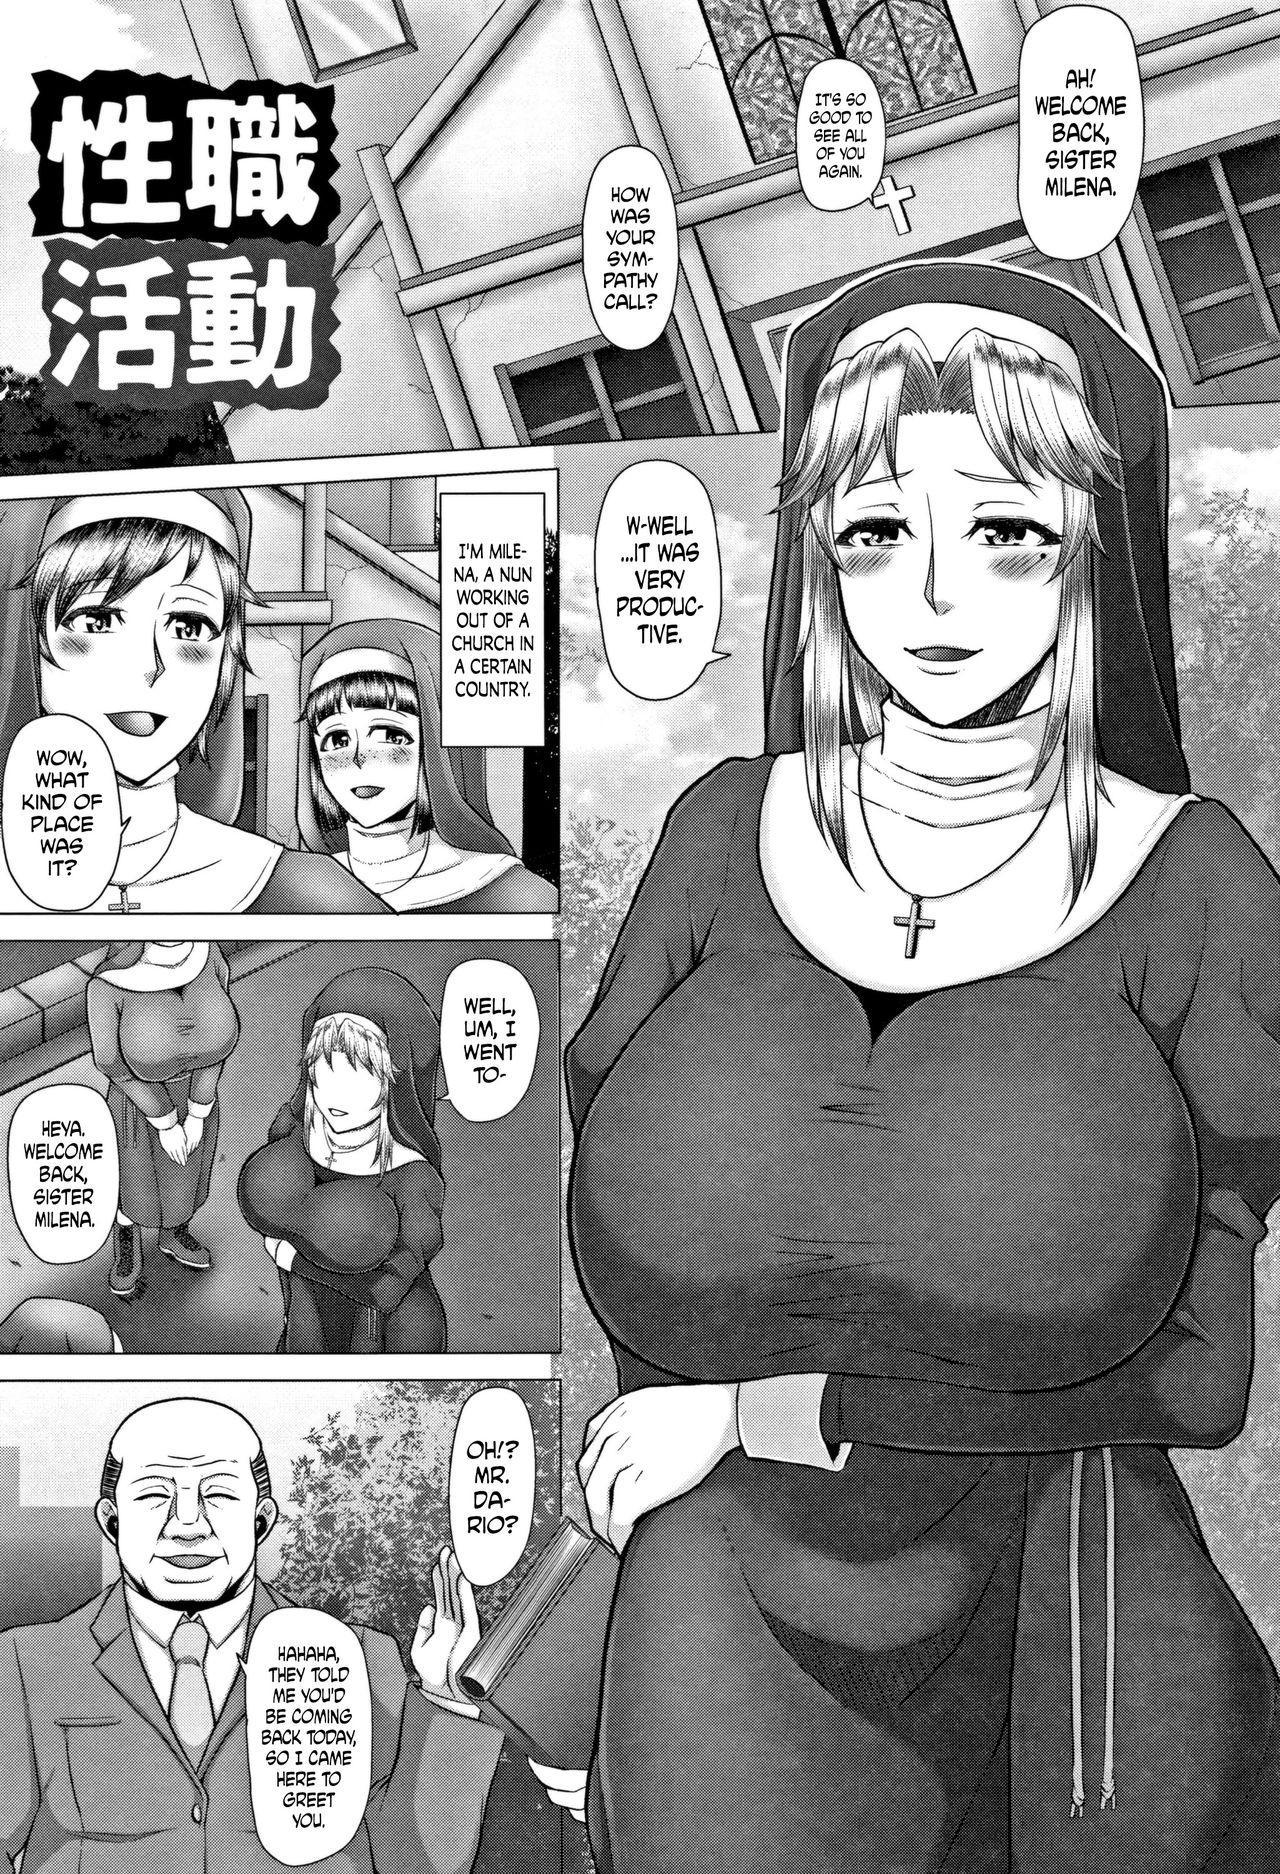 [Inoue Nanaki] Joushiki Daha! Kuro Gal Bitch-ka Seikatsu Ch. 1-3, 5-8 [English] [Dark Mac + N04h] 46